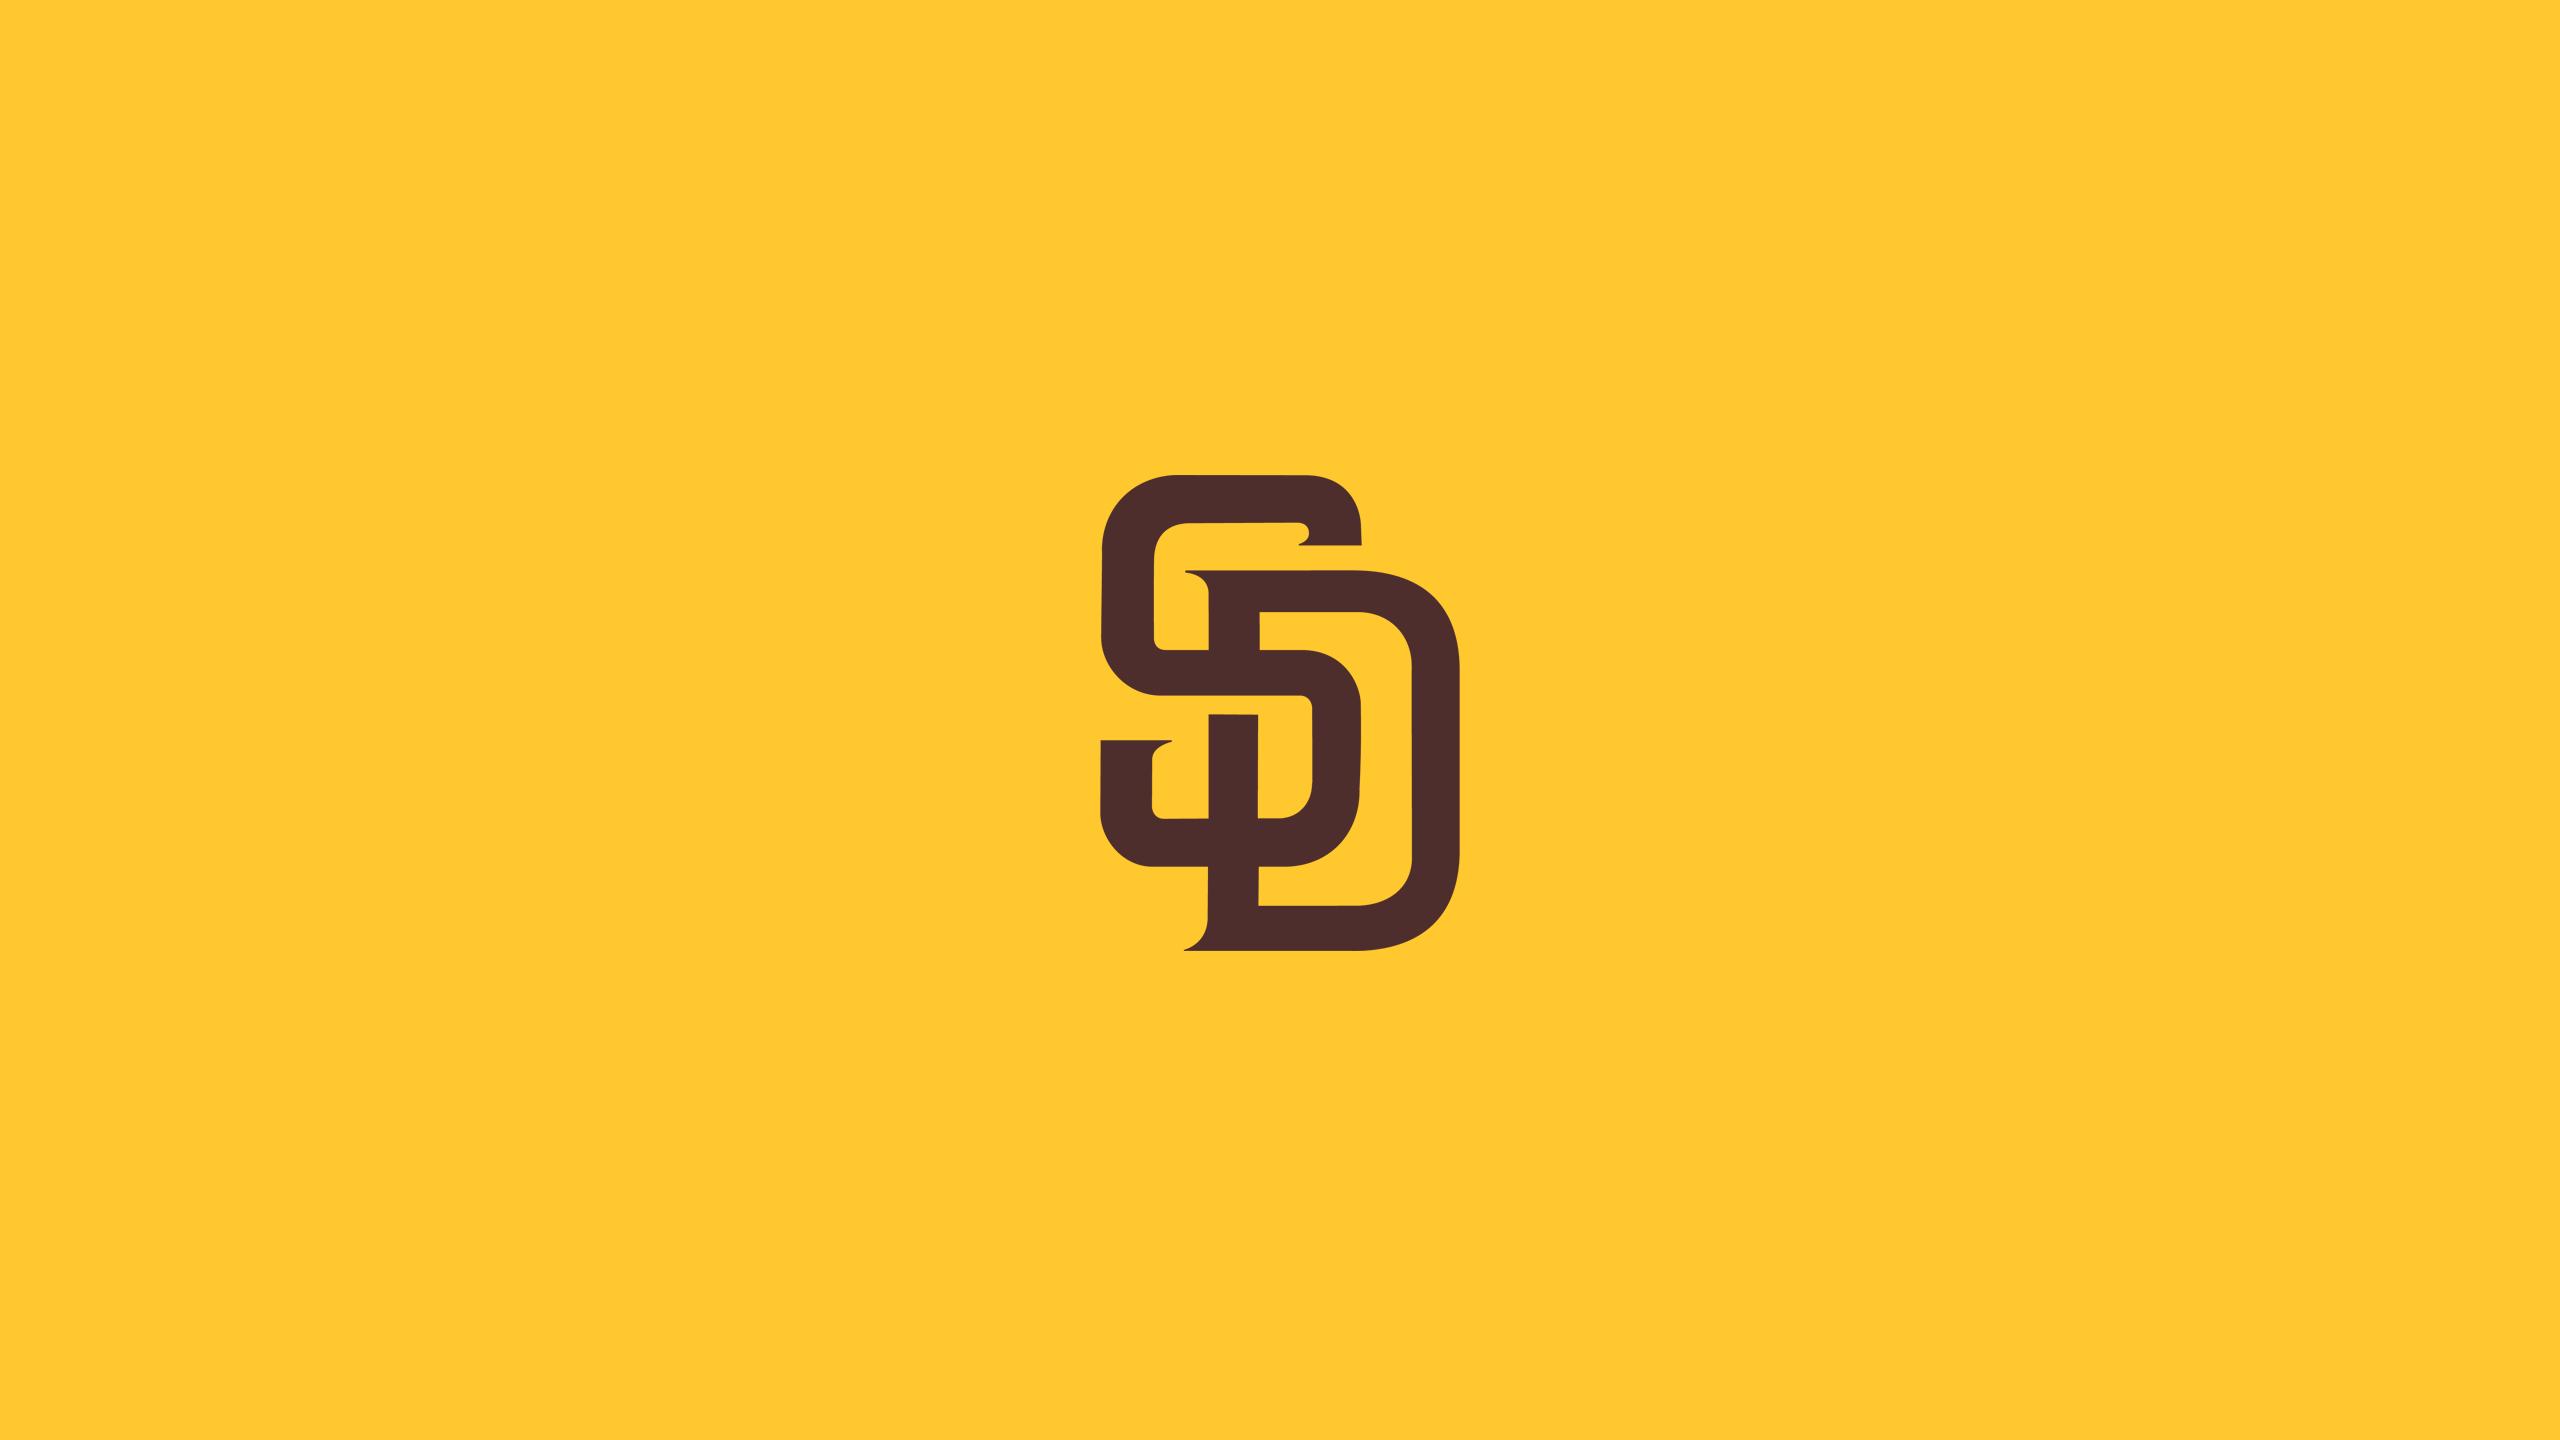 San Diego Padres (Alt)